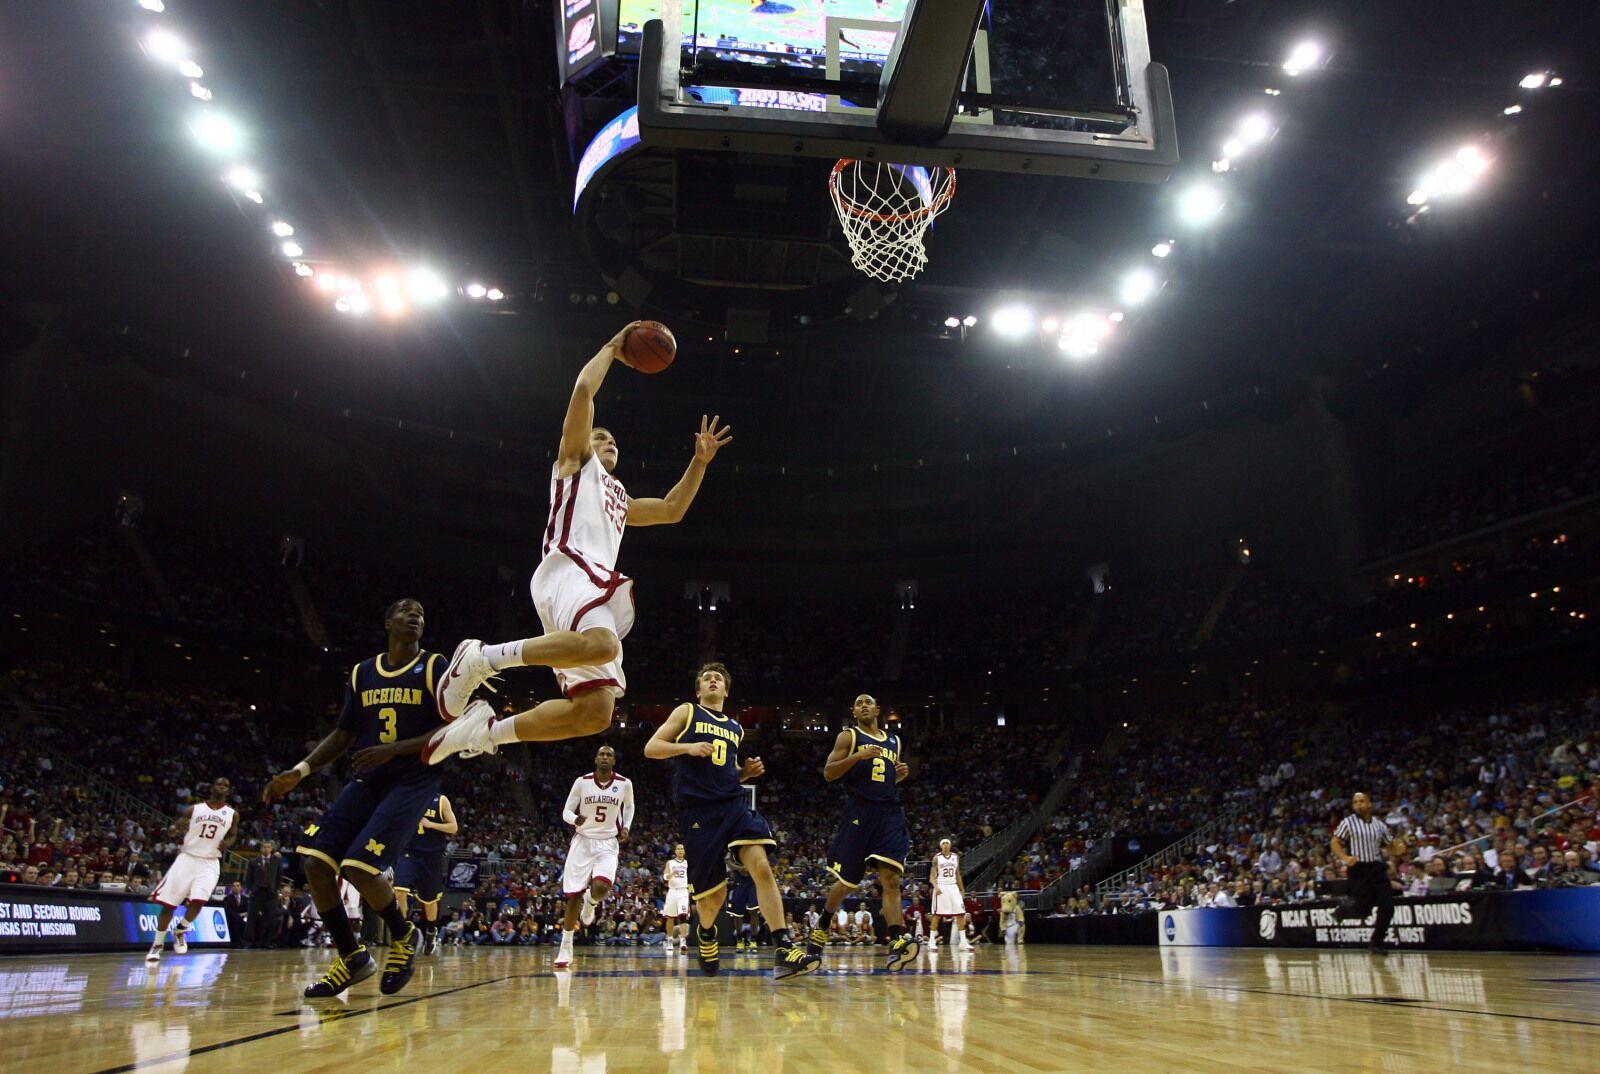 Detroit Pistons: Remembering Blake Griffin's insane career at Oklahoma